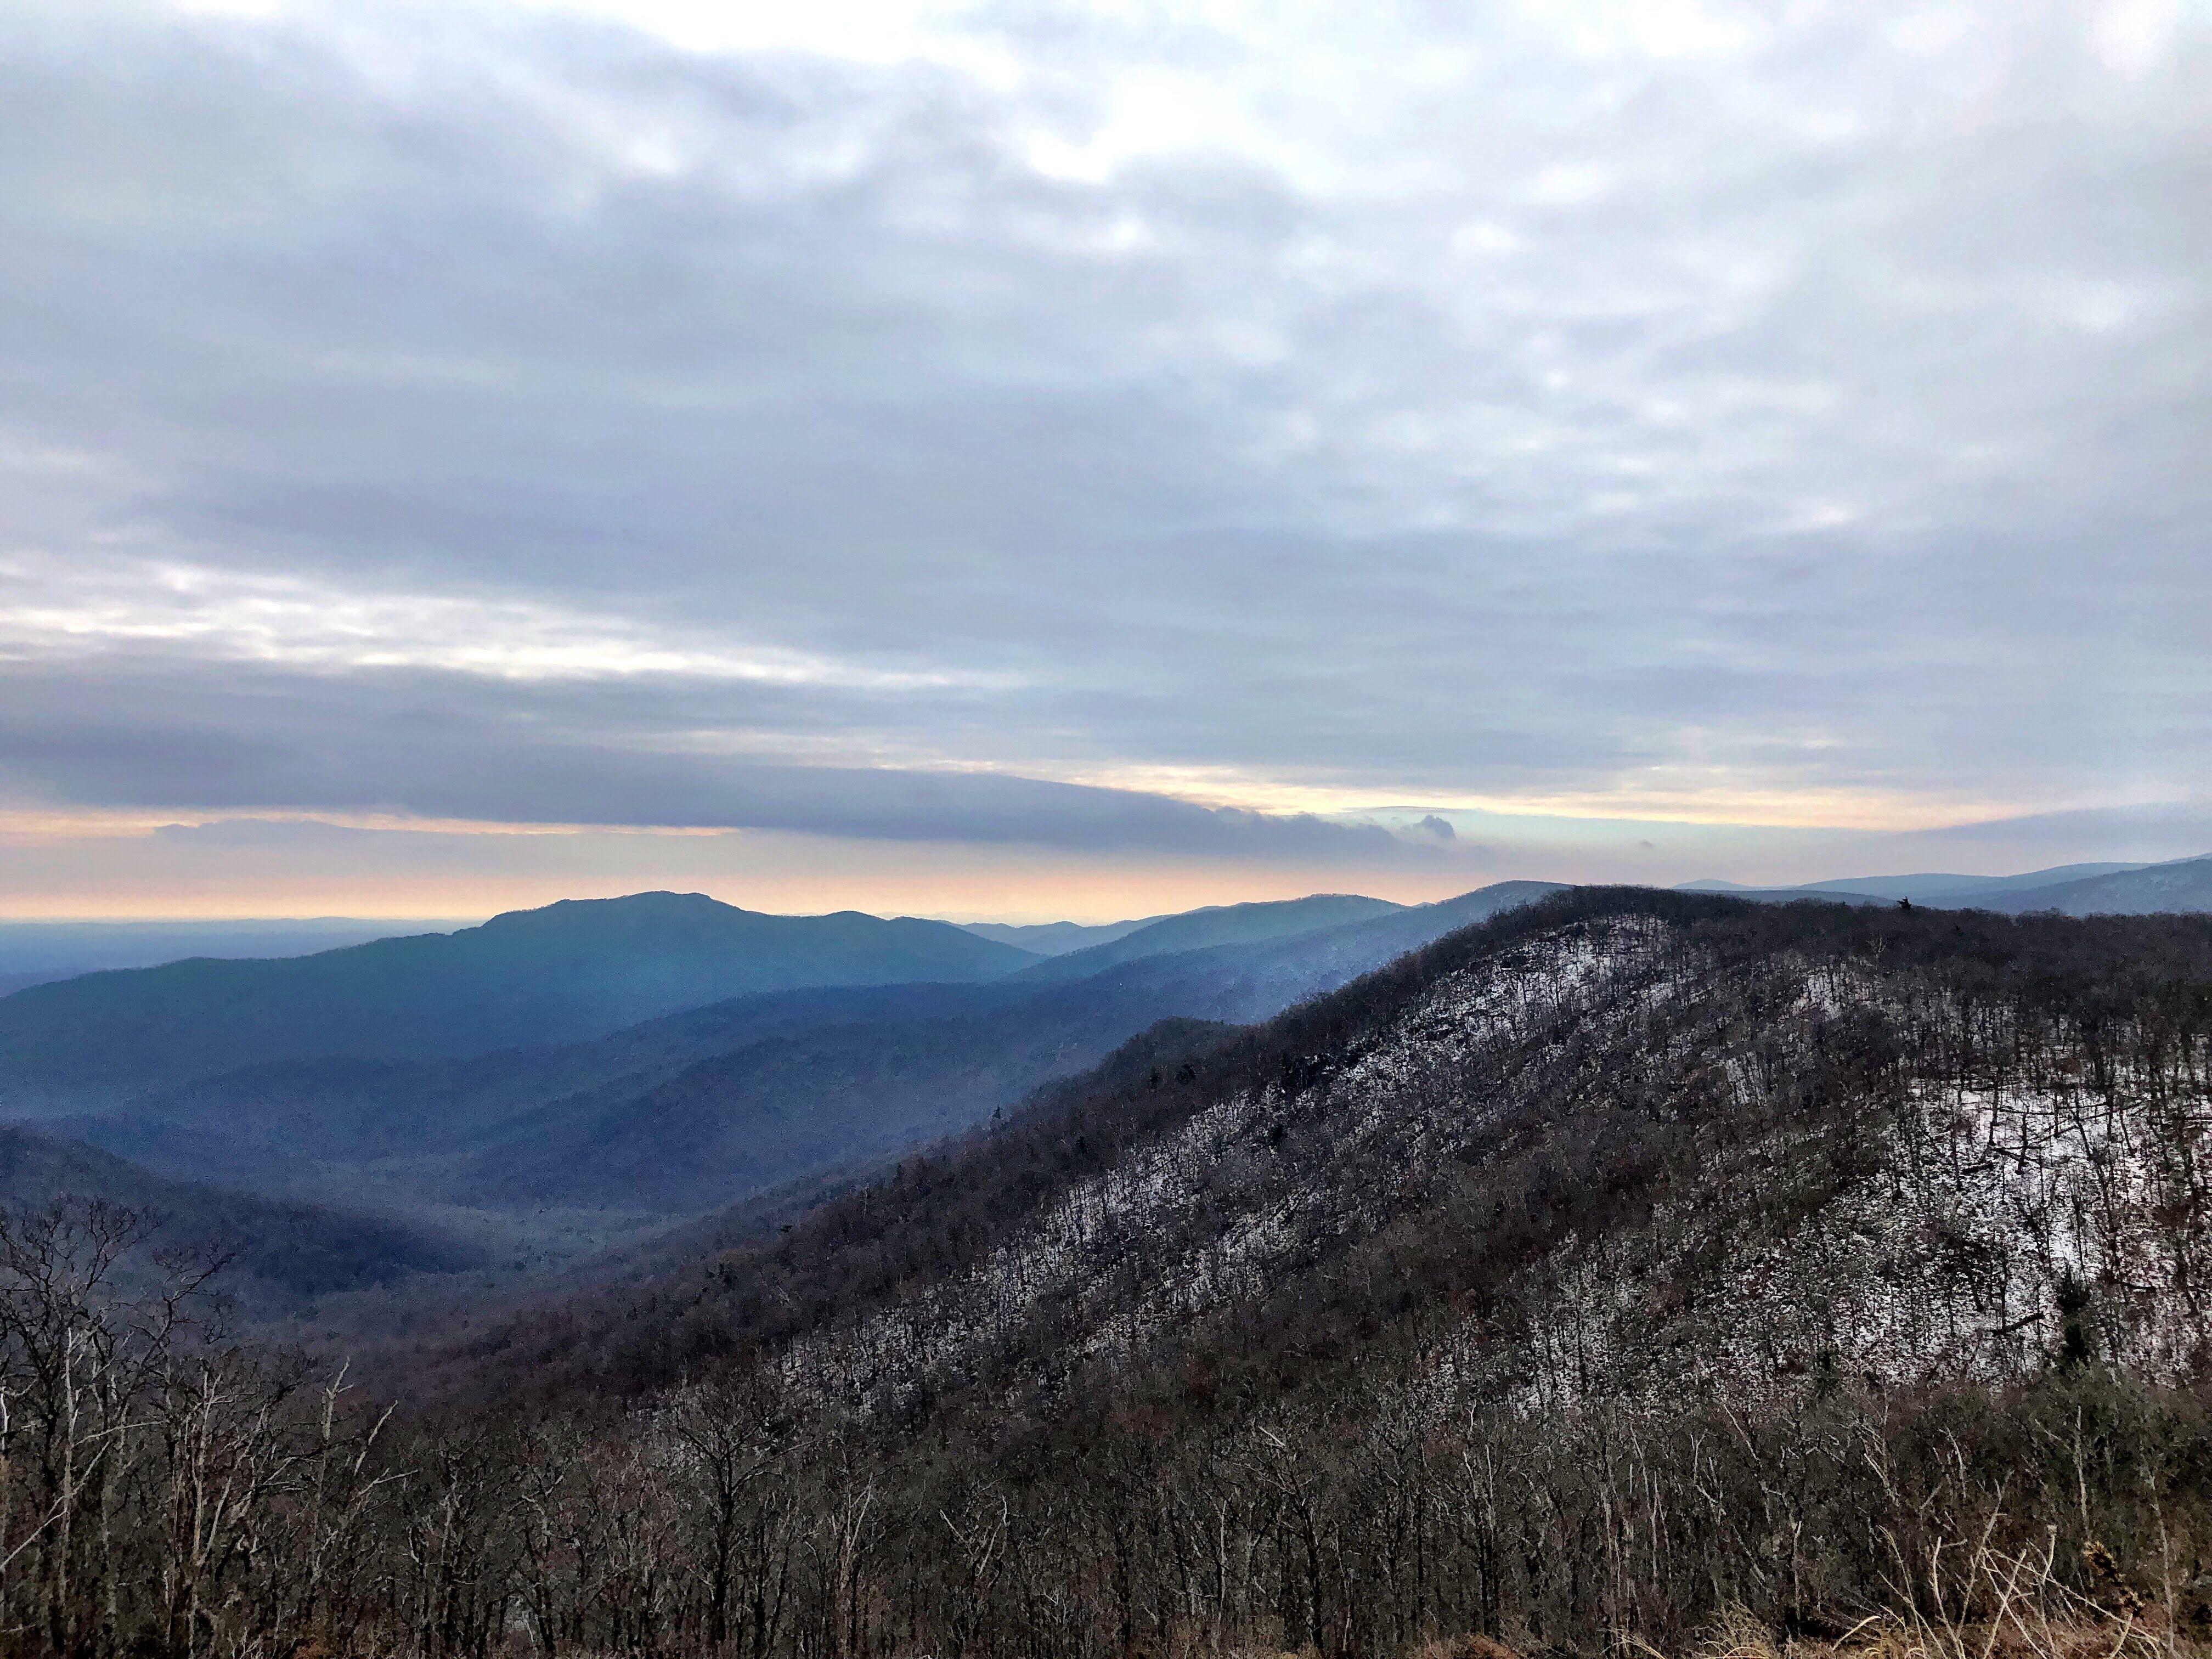 Mountain views in Shenandoah National Park